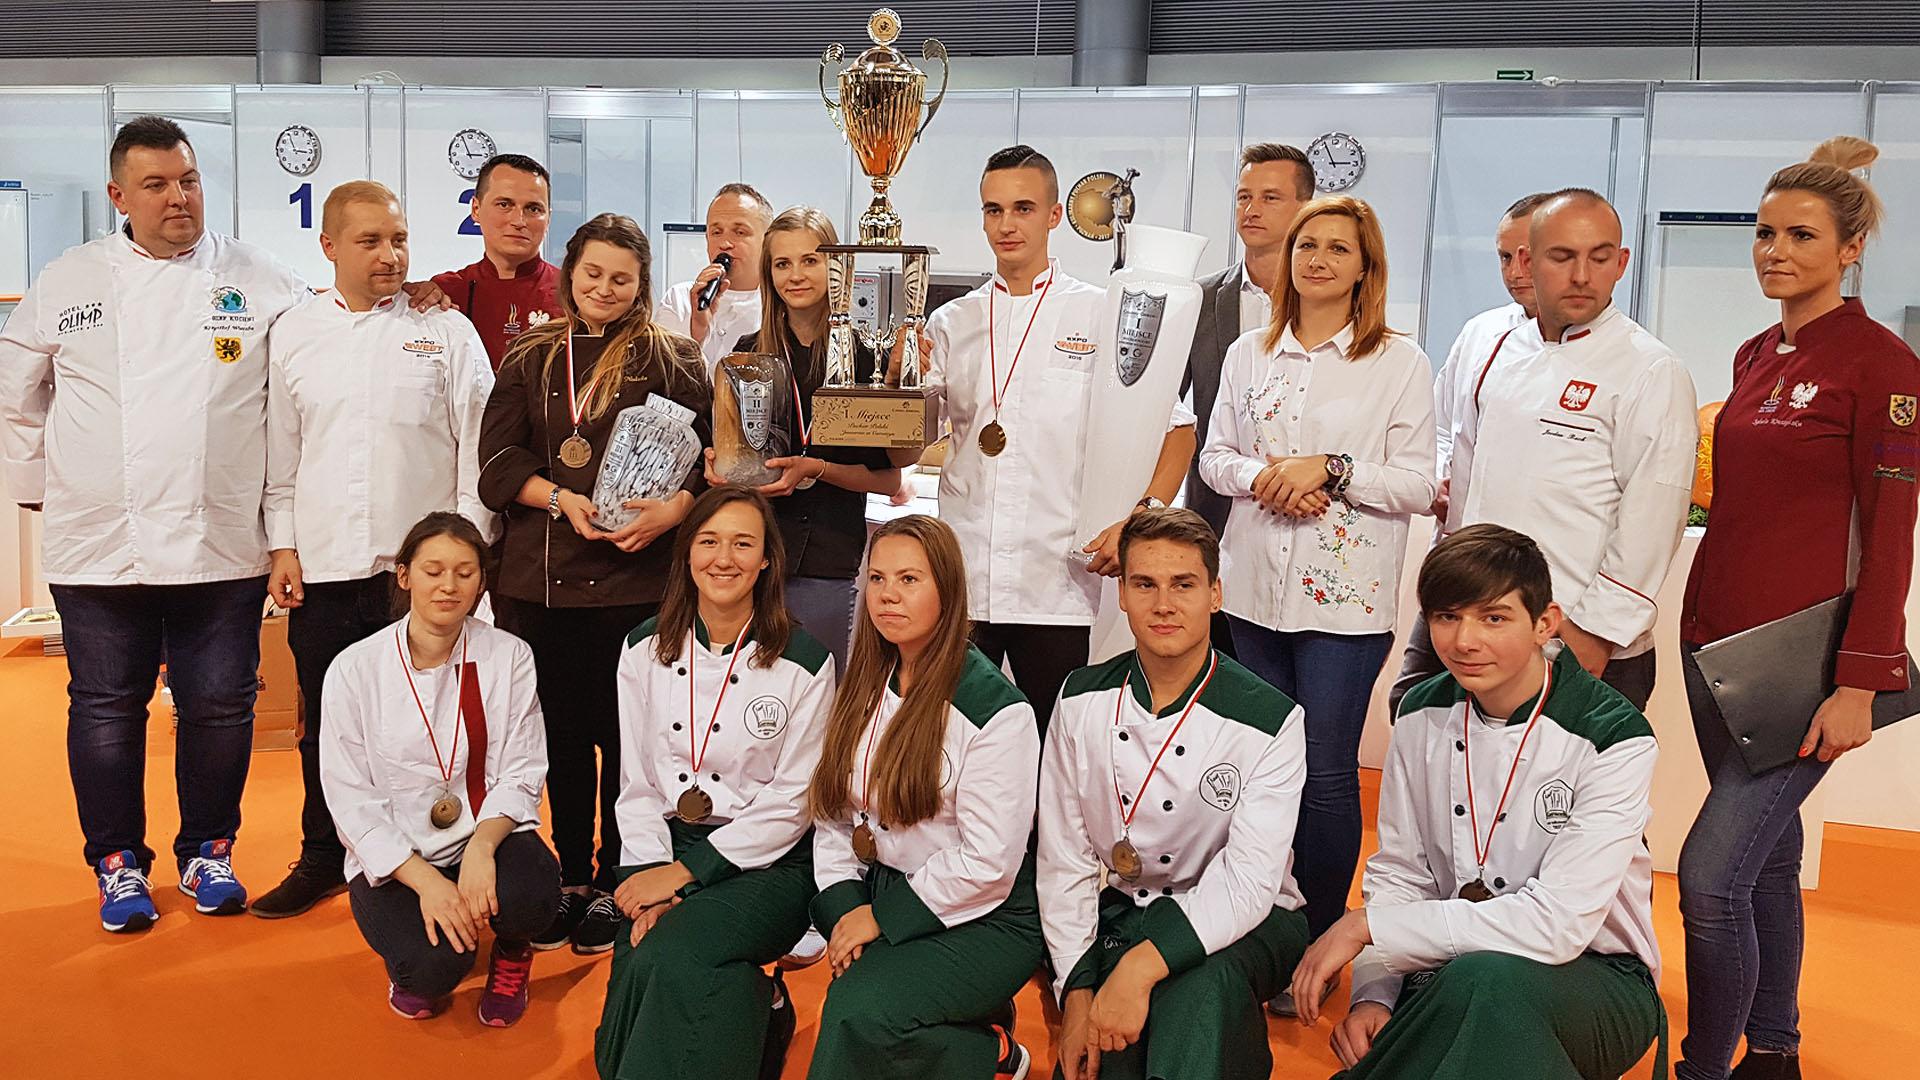 puchar-polski-juniorow-w-carvingu-2017